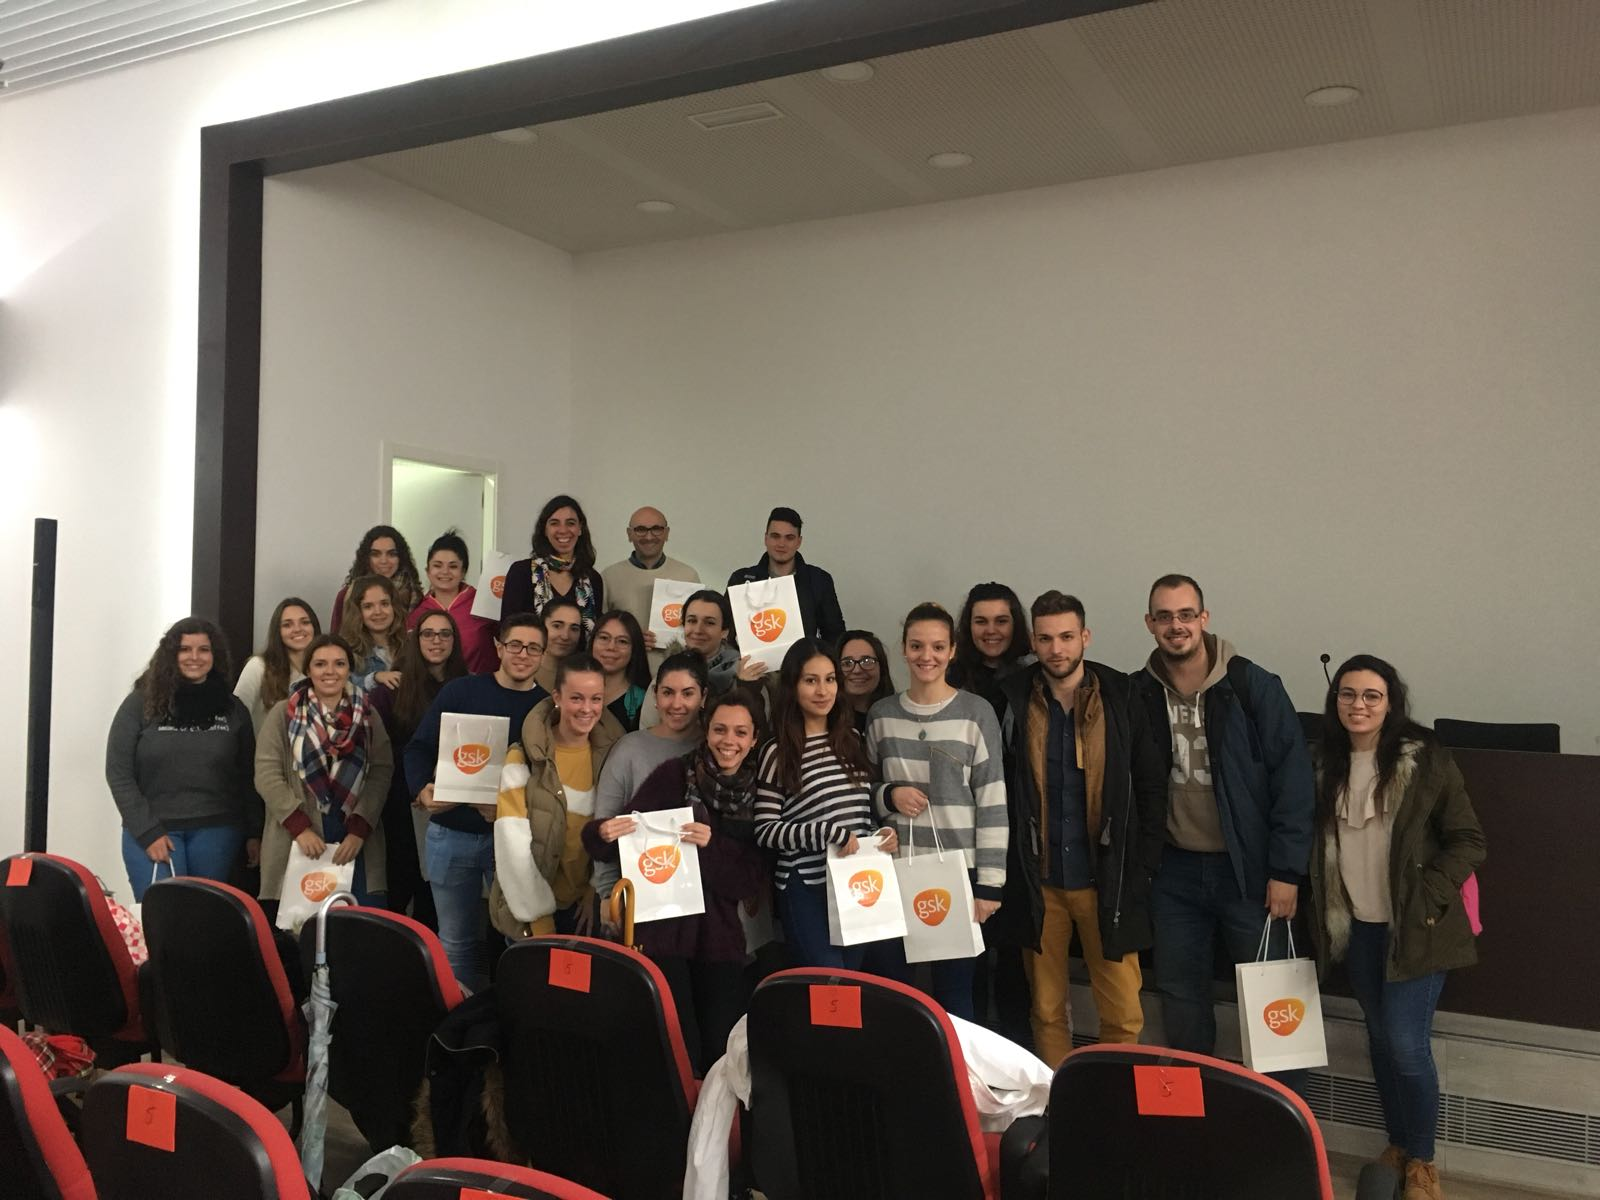 Charla de laboratorios gsk para higiene bucodental for Oficina virtual junta de andalucia educacion